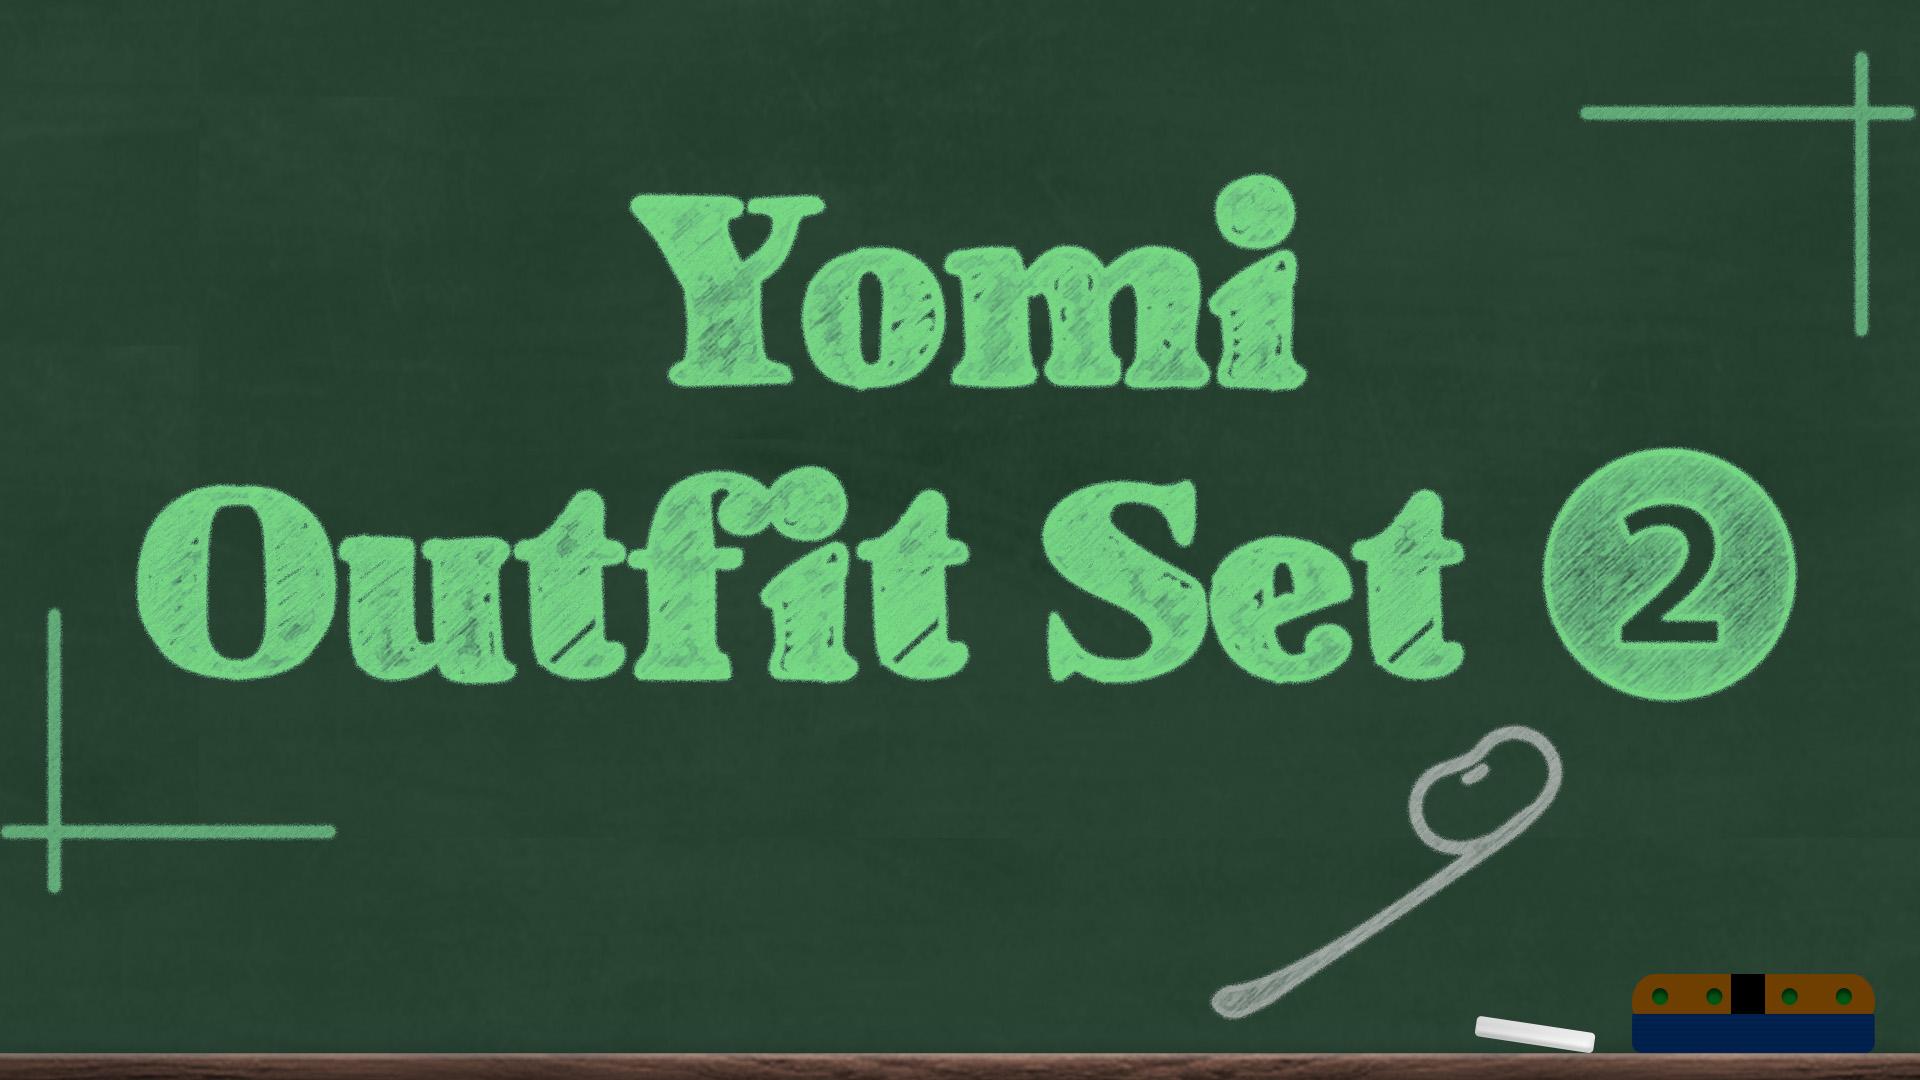 Yomi Outfit Set 2